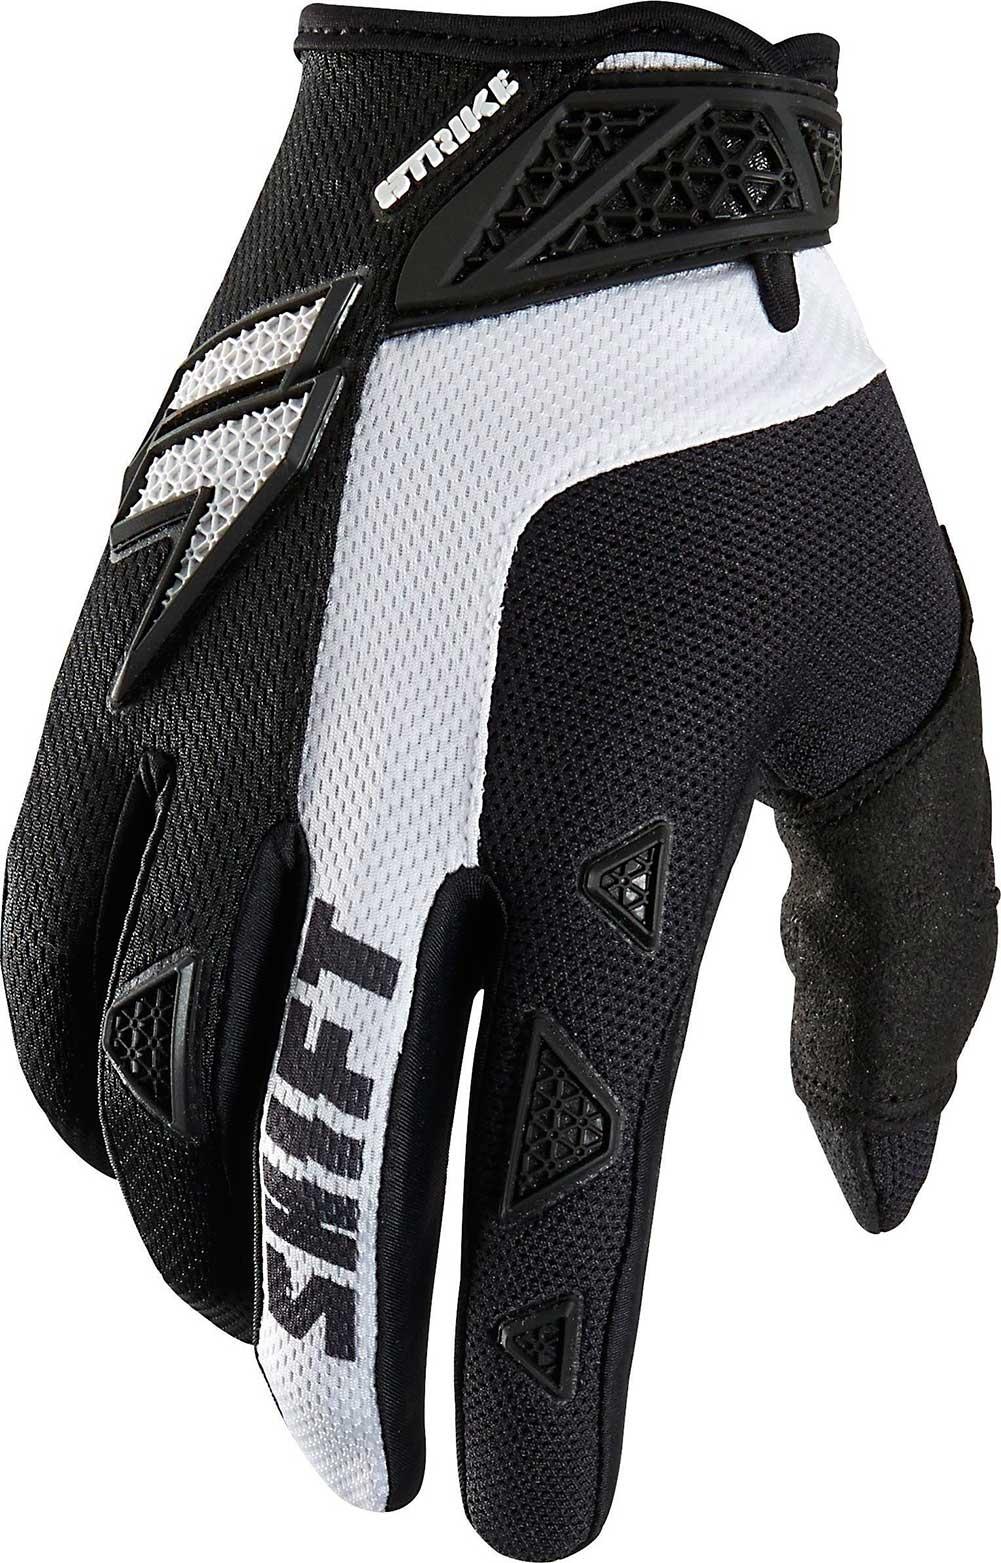 Shift Black White Strike Army Dirt Bike Gloves 2015 Mx Atv Gear